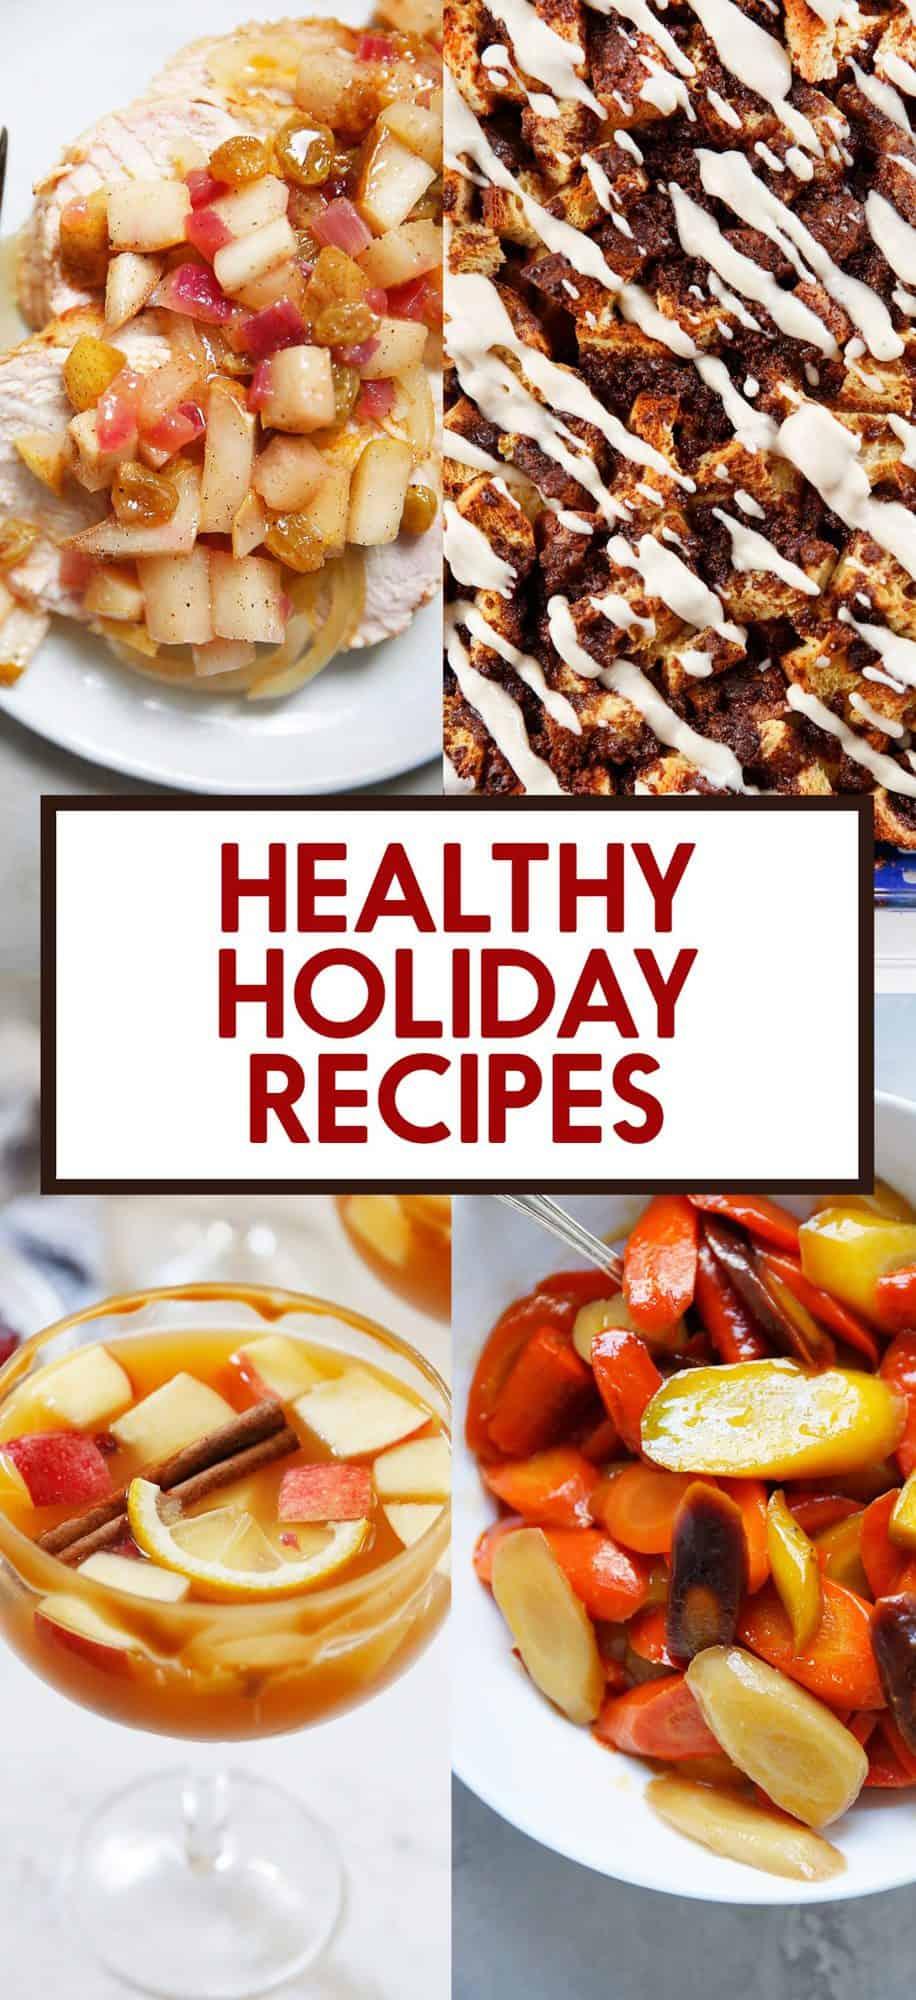 Healthy holiday recipes round up